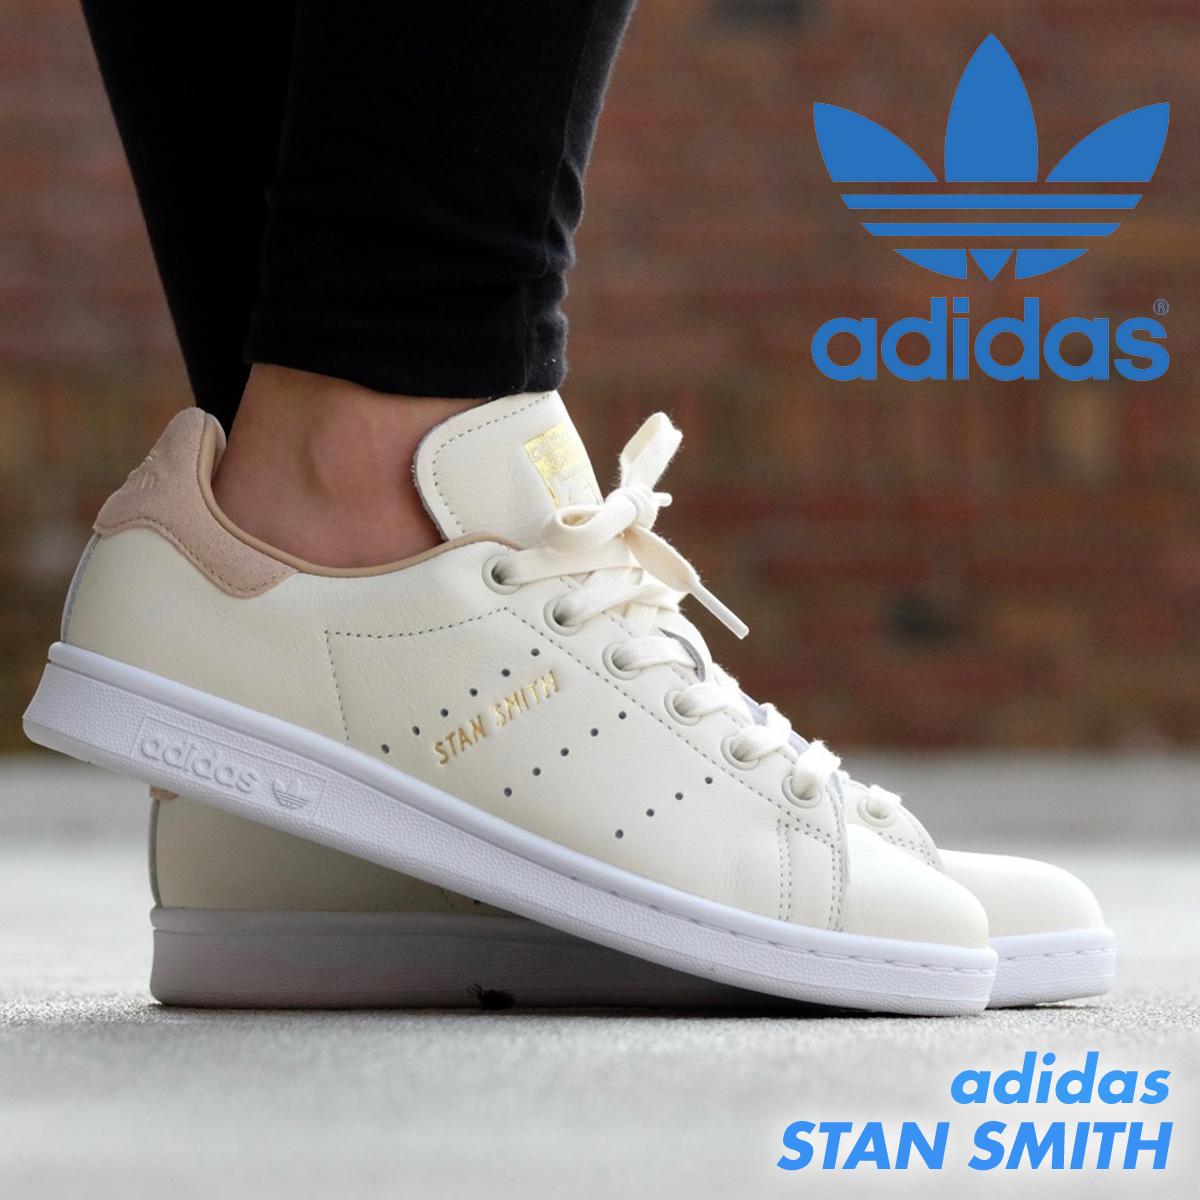 stan smith 7